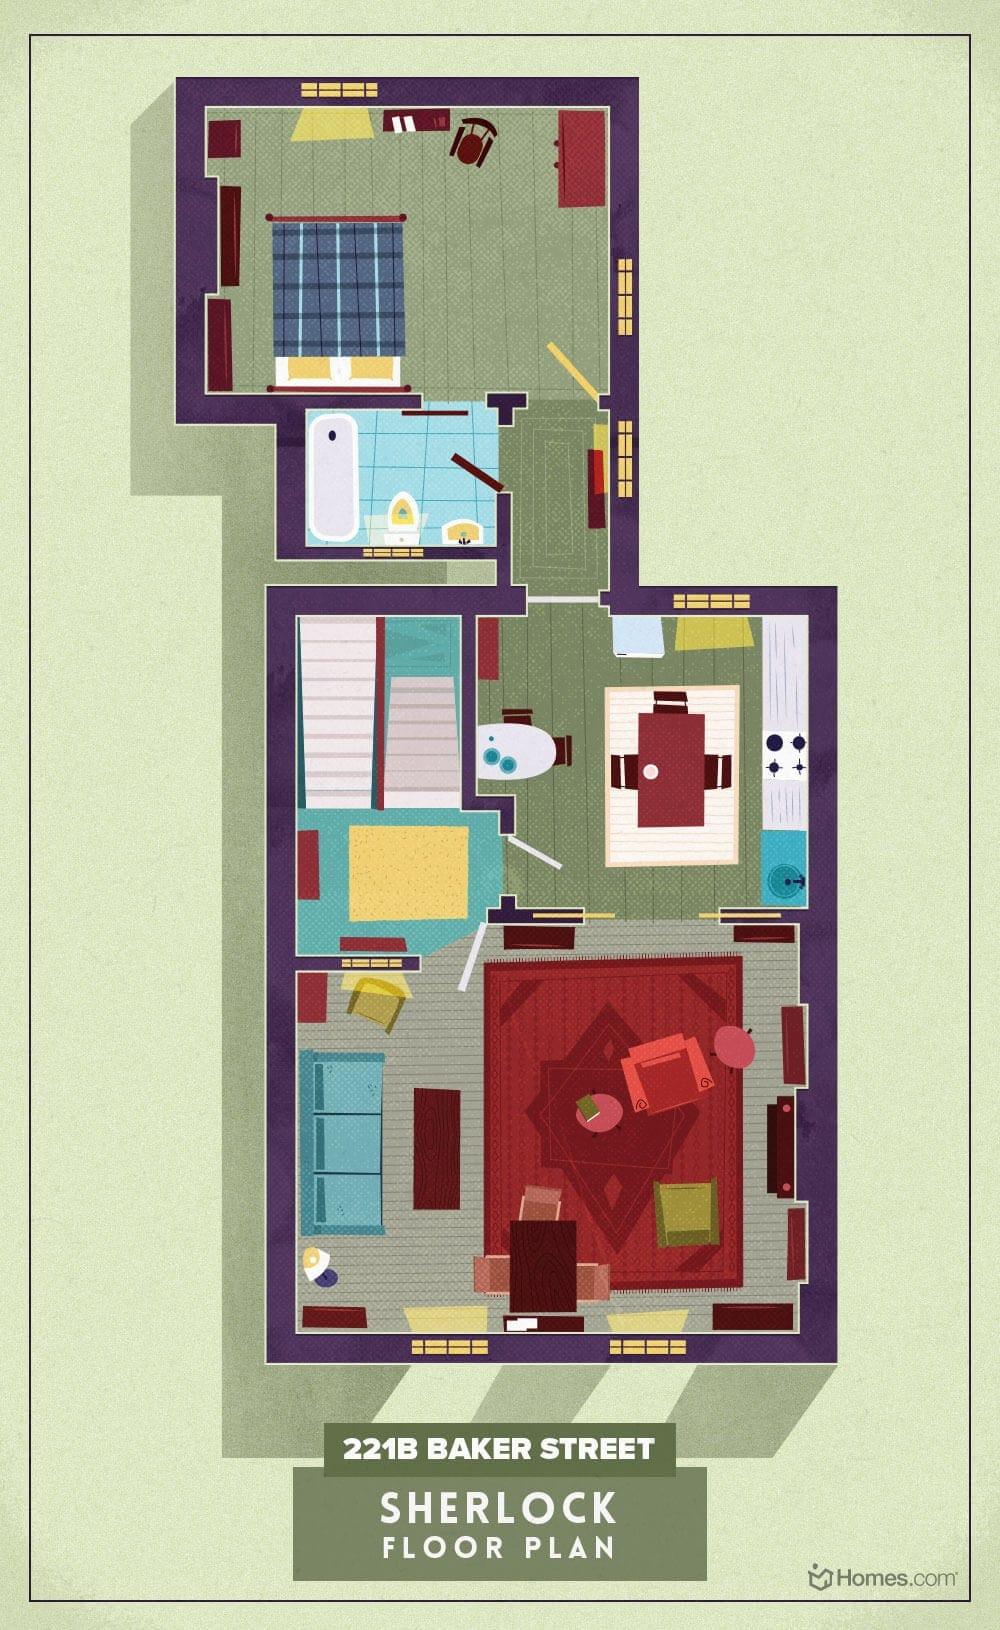 home-floor-plans-illustrations-7